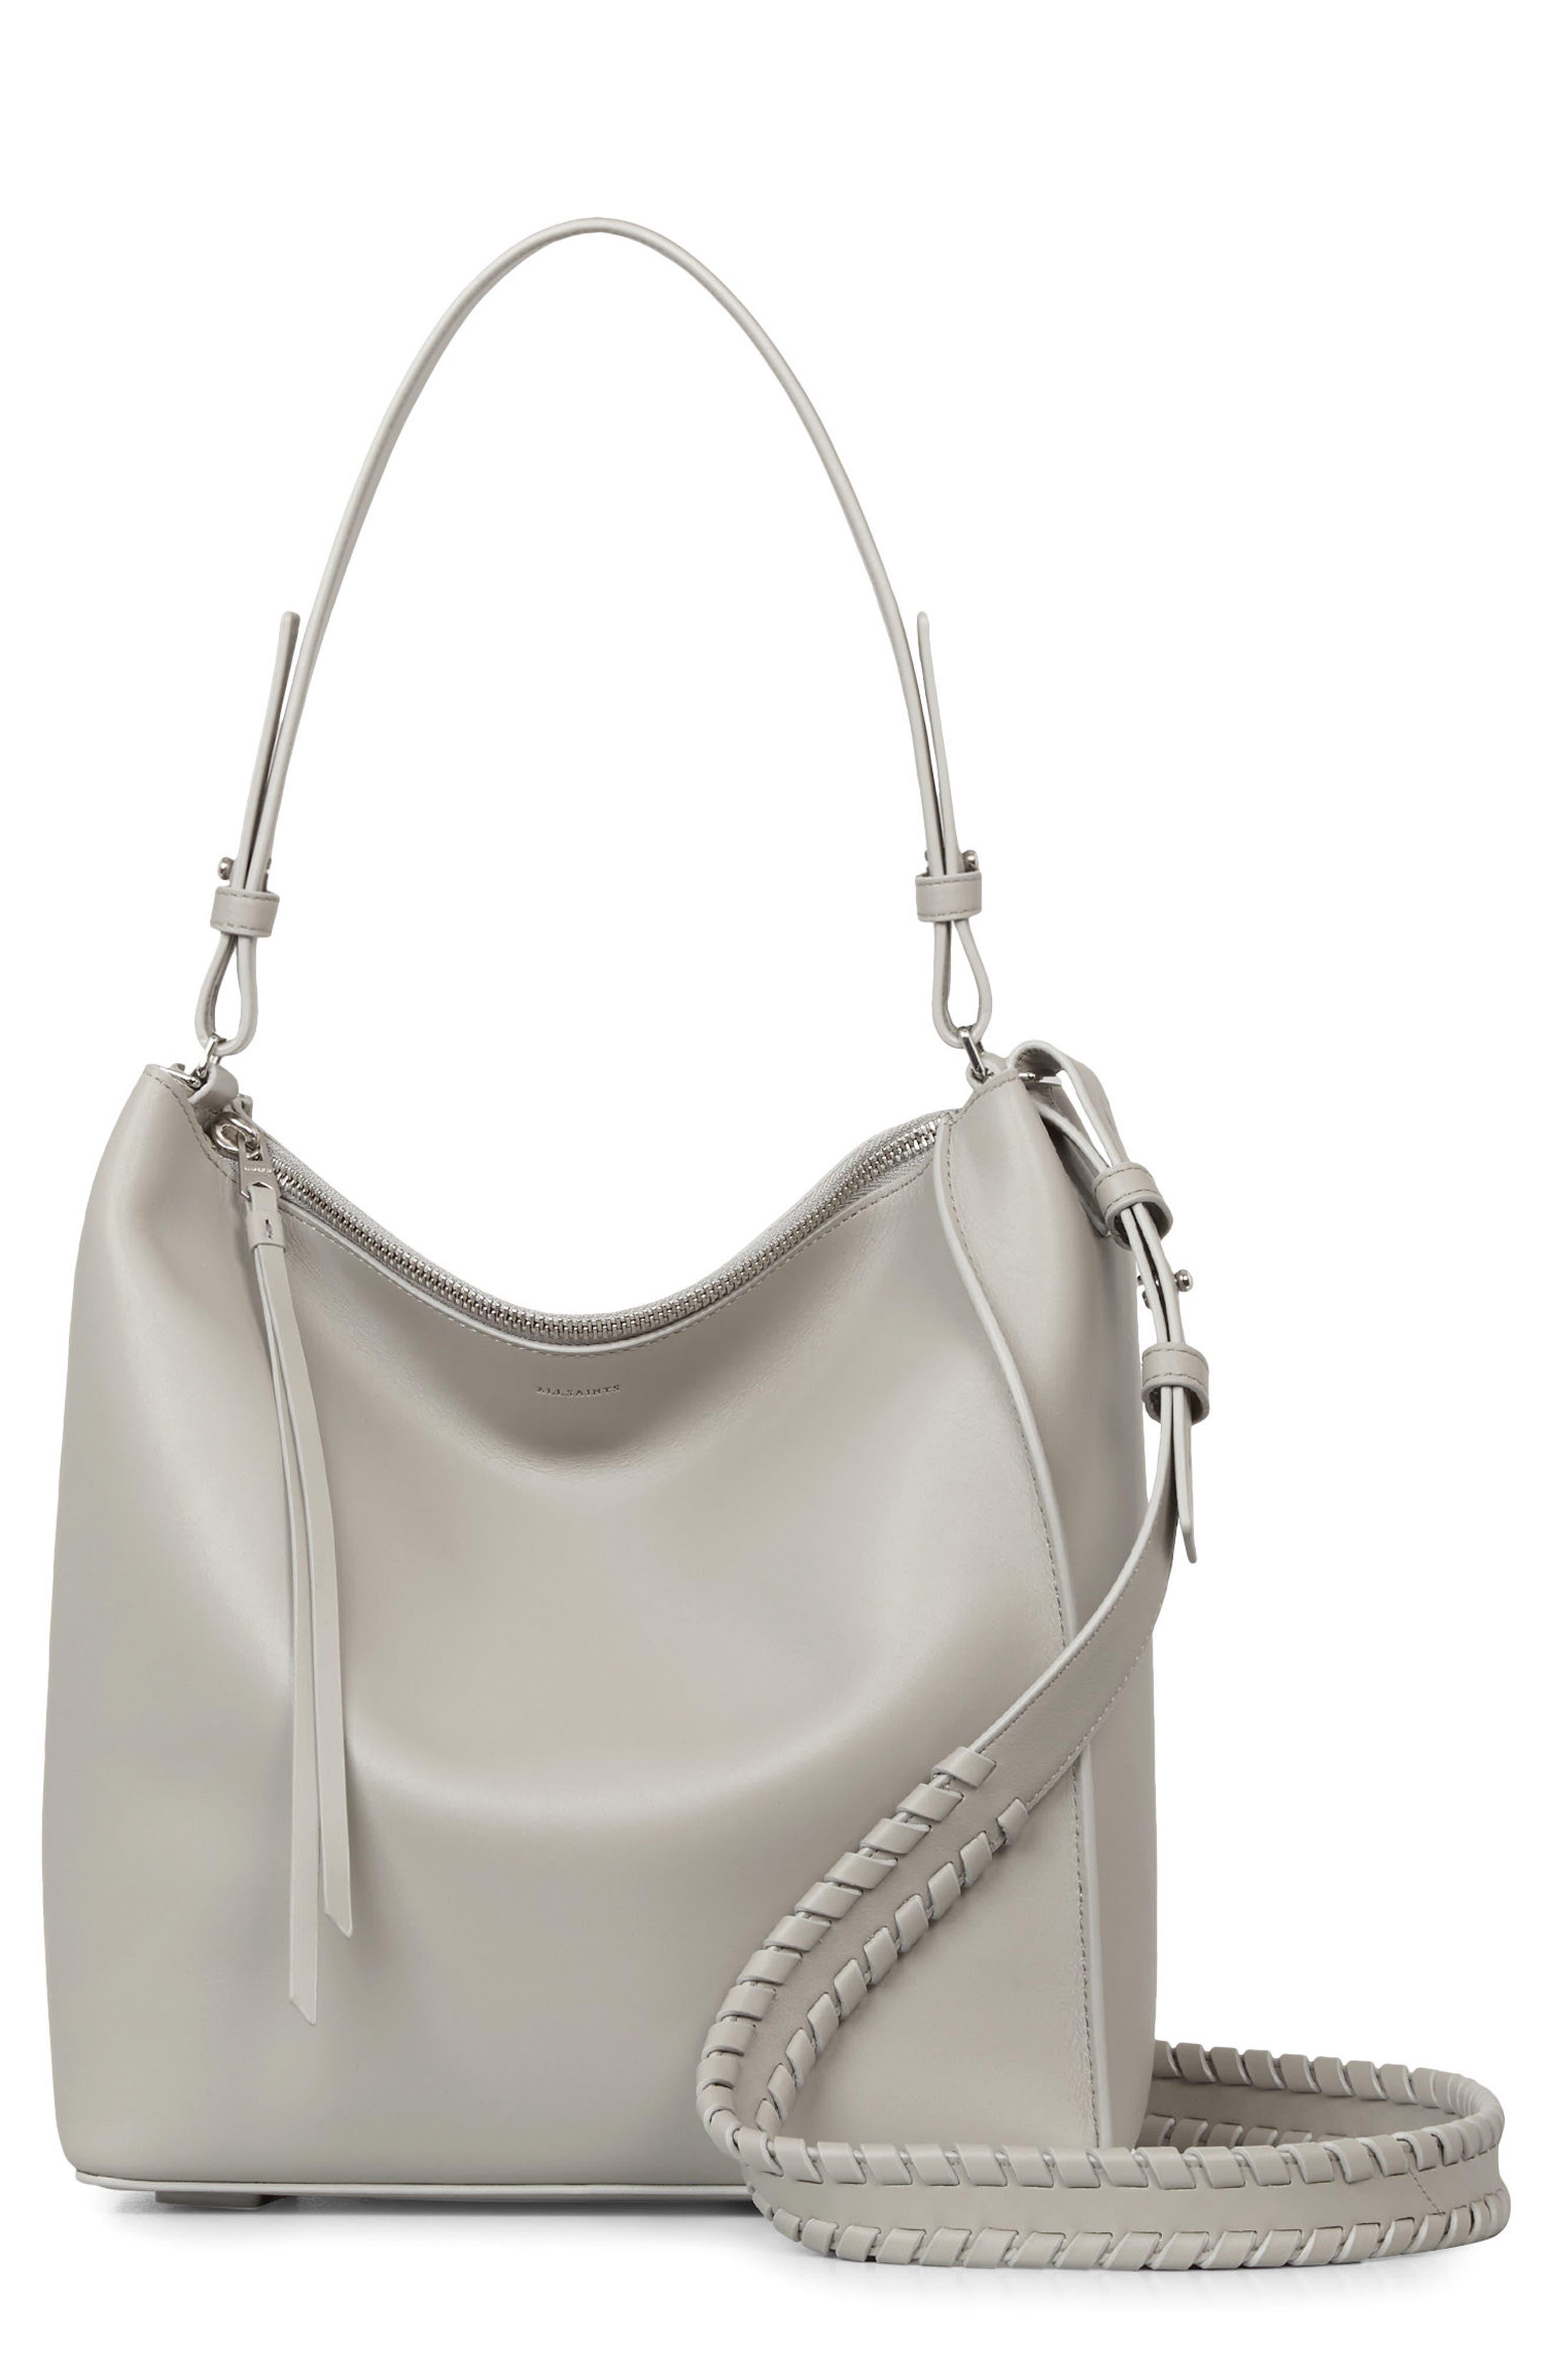 Kita Leather Shoulder/Crossbody Bag,                             Main thumbnail 1, color,                             052